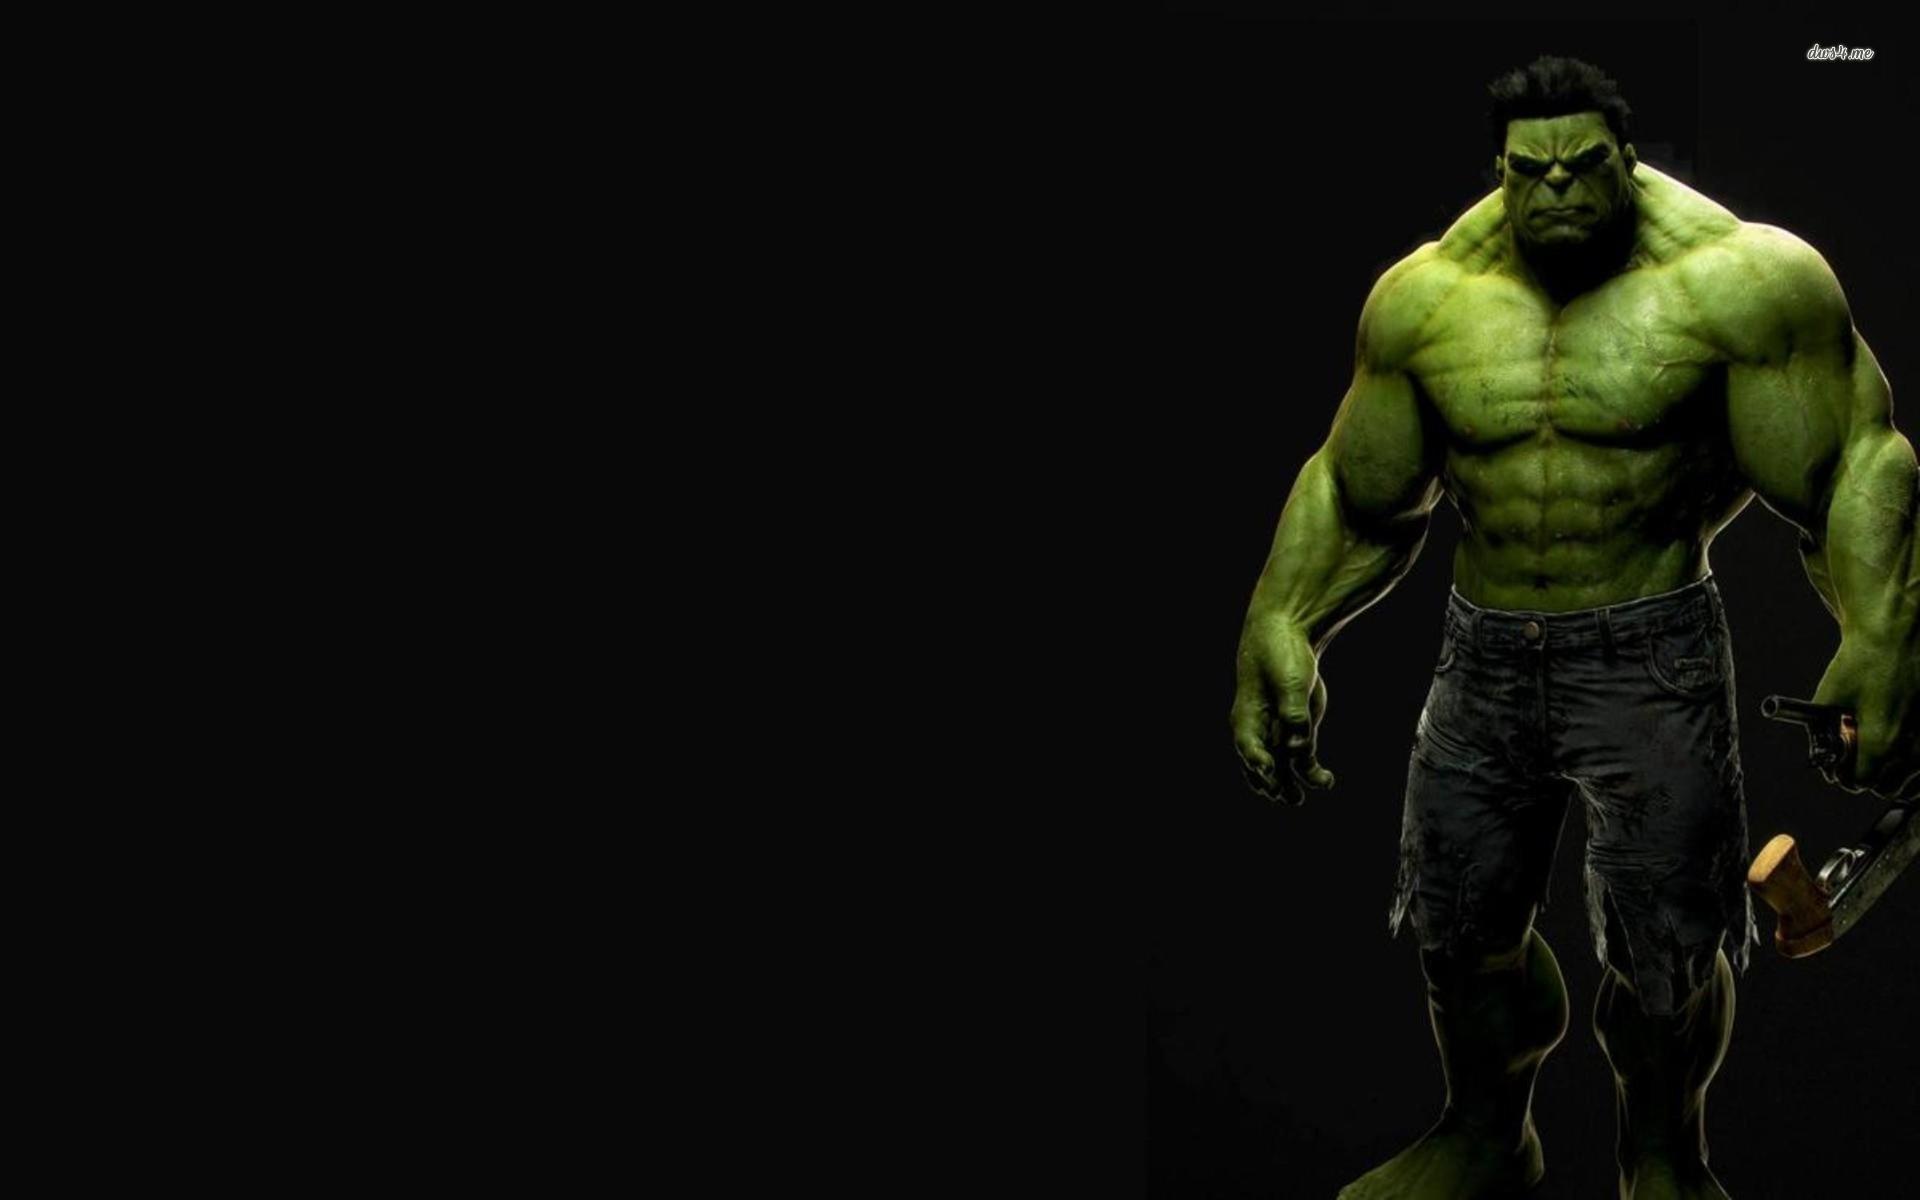 Hulk download wallpapers